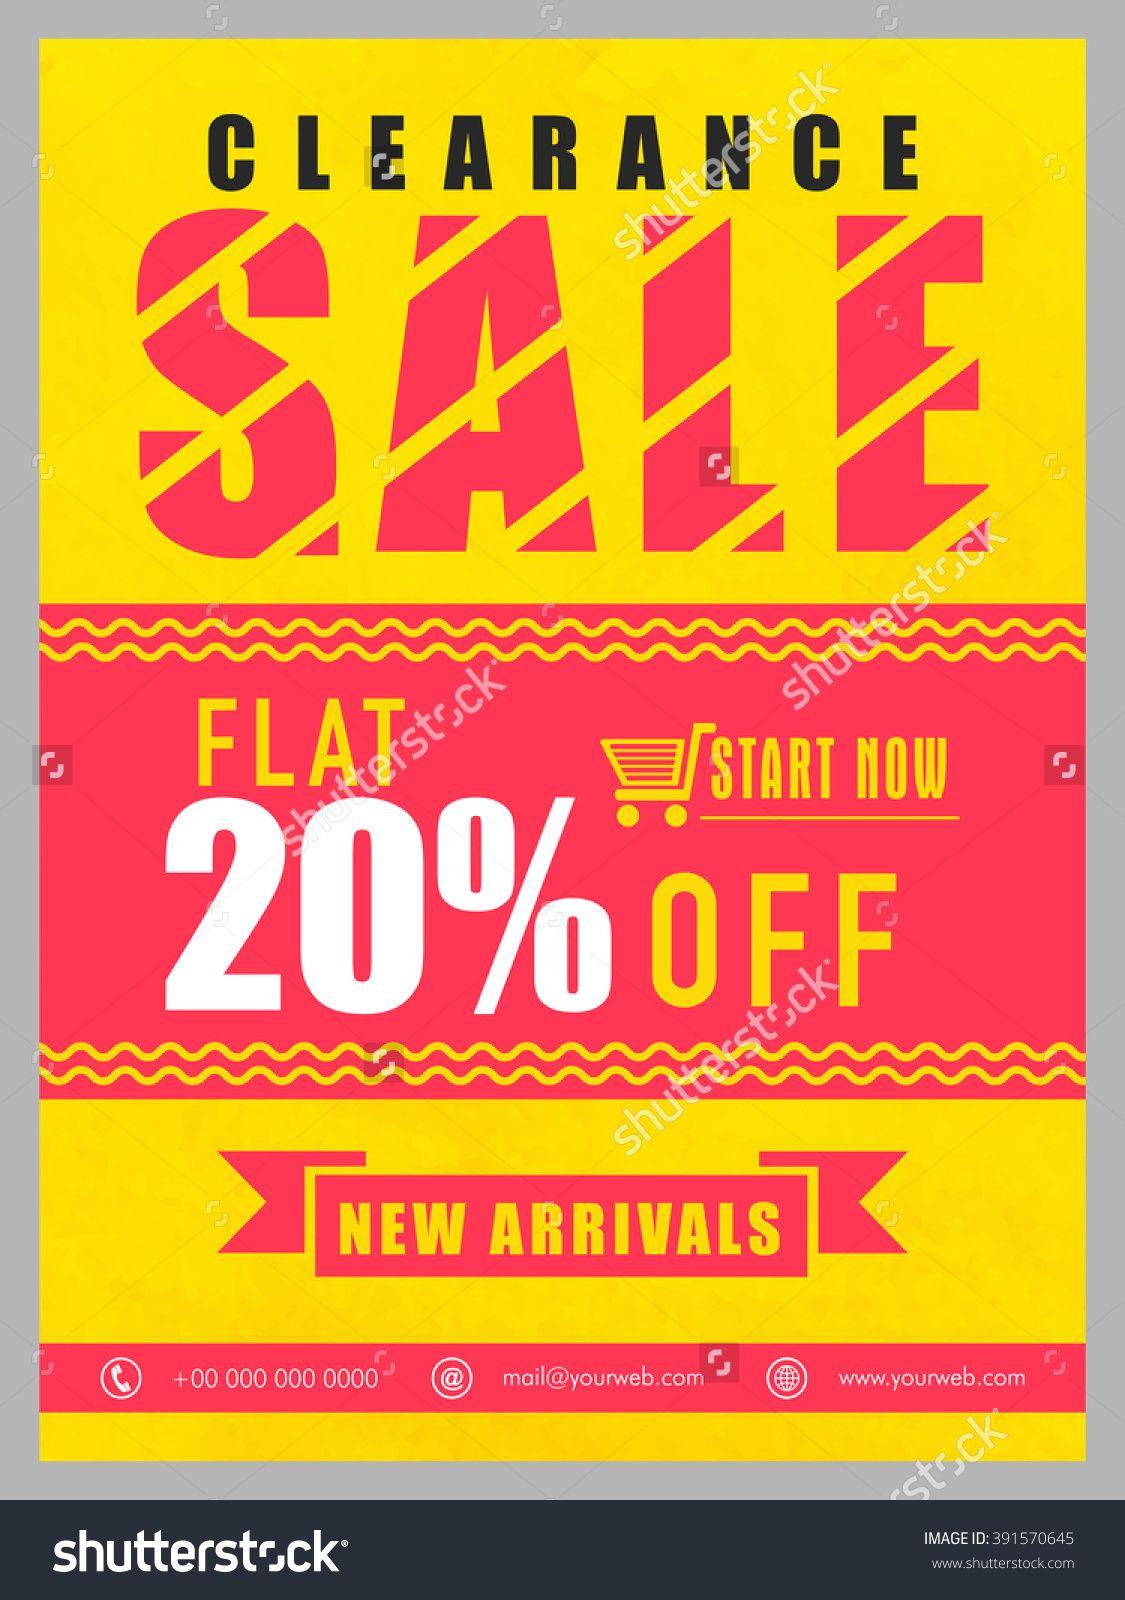 Clearance Sale Banner Sale Poster Sale Flyer Sale Vector 25 Off Sale Sale Banner Sale Poster Clearance Sale Banner